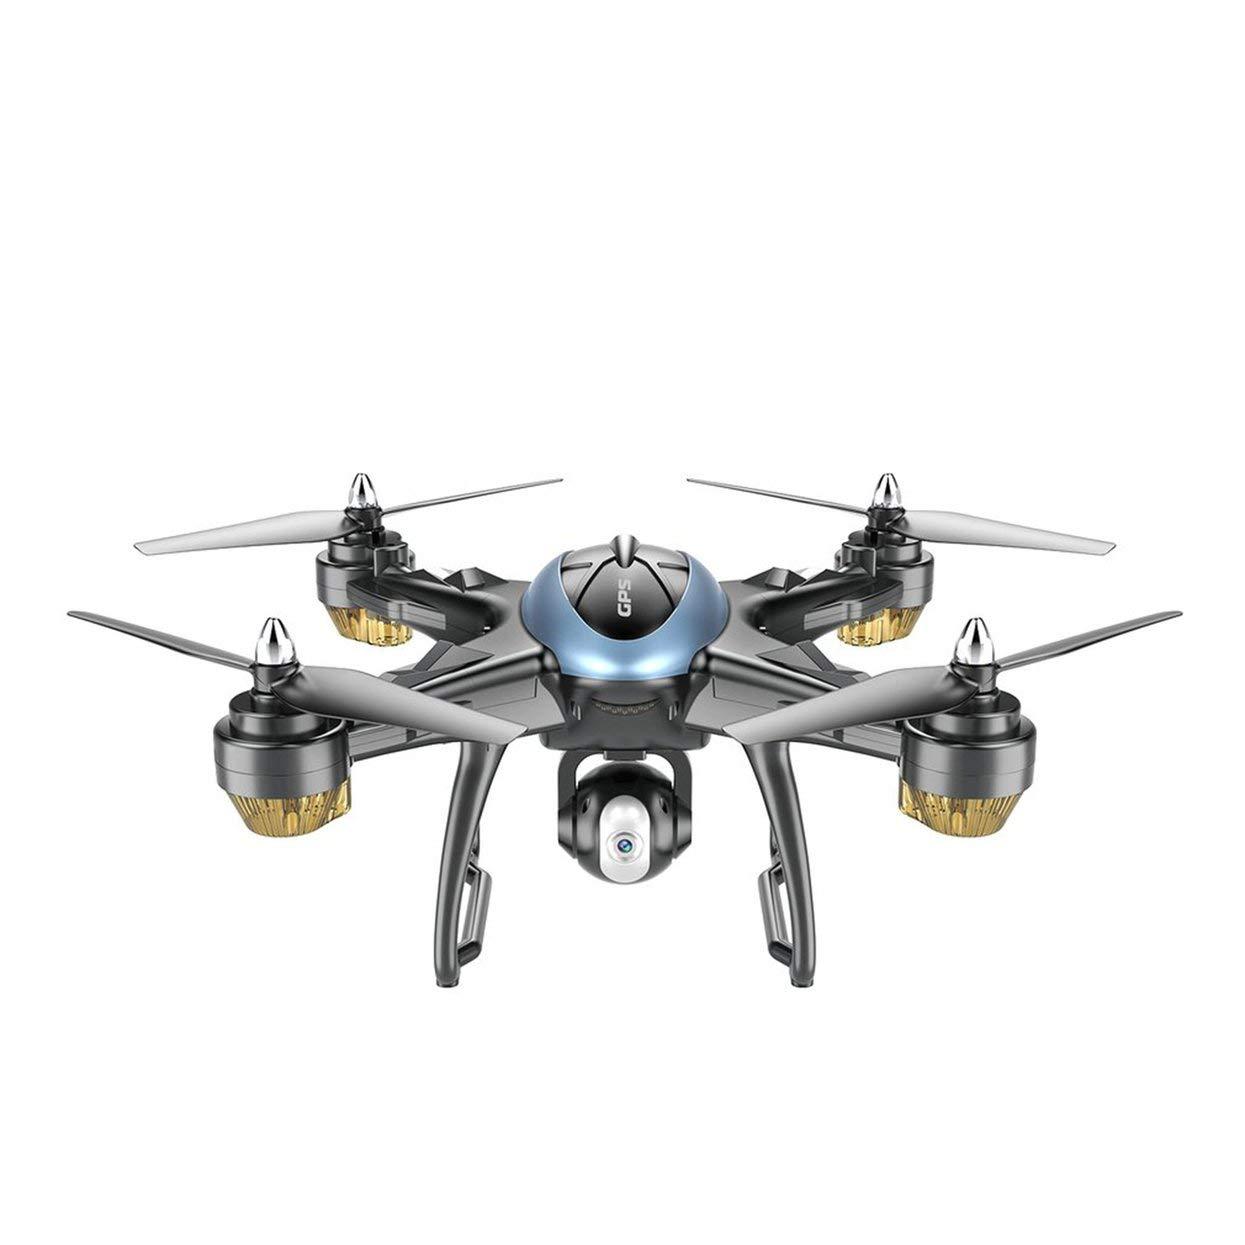 Tellaboull X38G 720P Kamera 2.4G 500M Fernbedienung 6Axis WiFi Echtzeitübertragung Headless Höhenstand Quadcopter